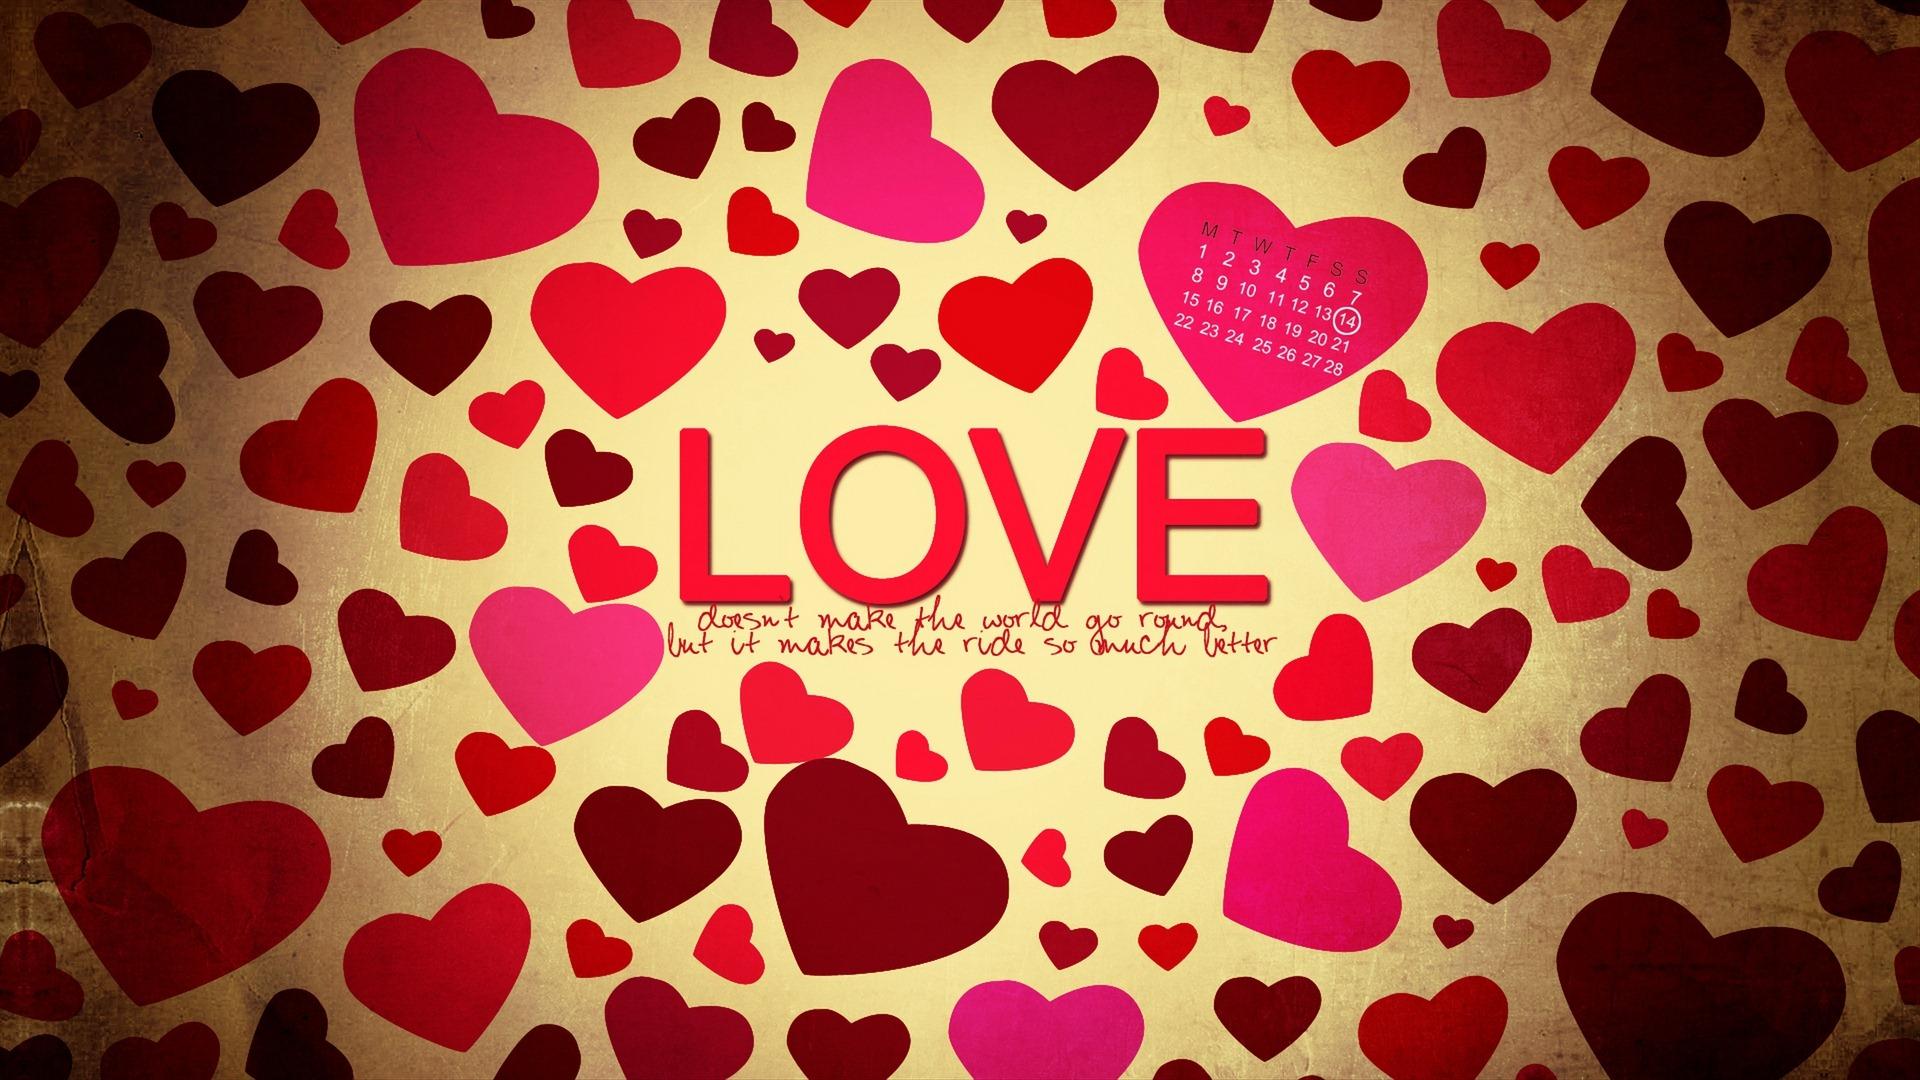 Best Wallpaper Of Love | PixelsTalk Net